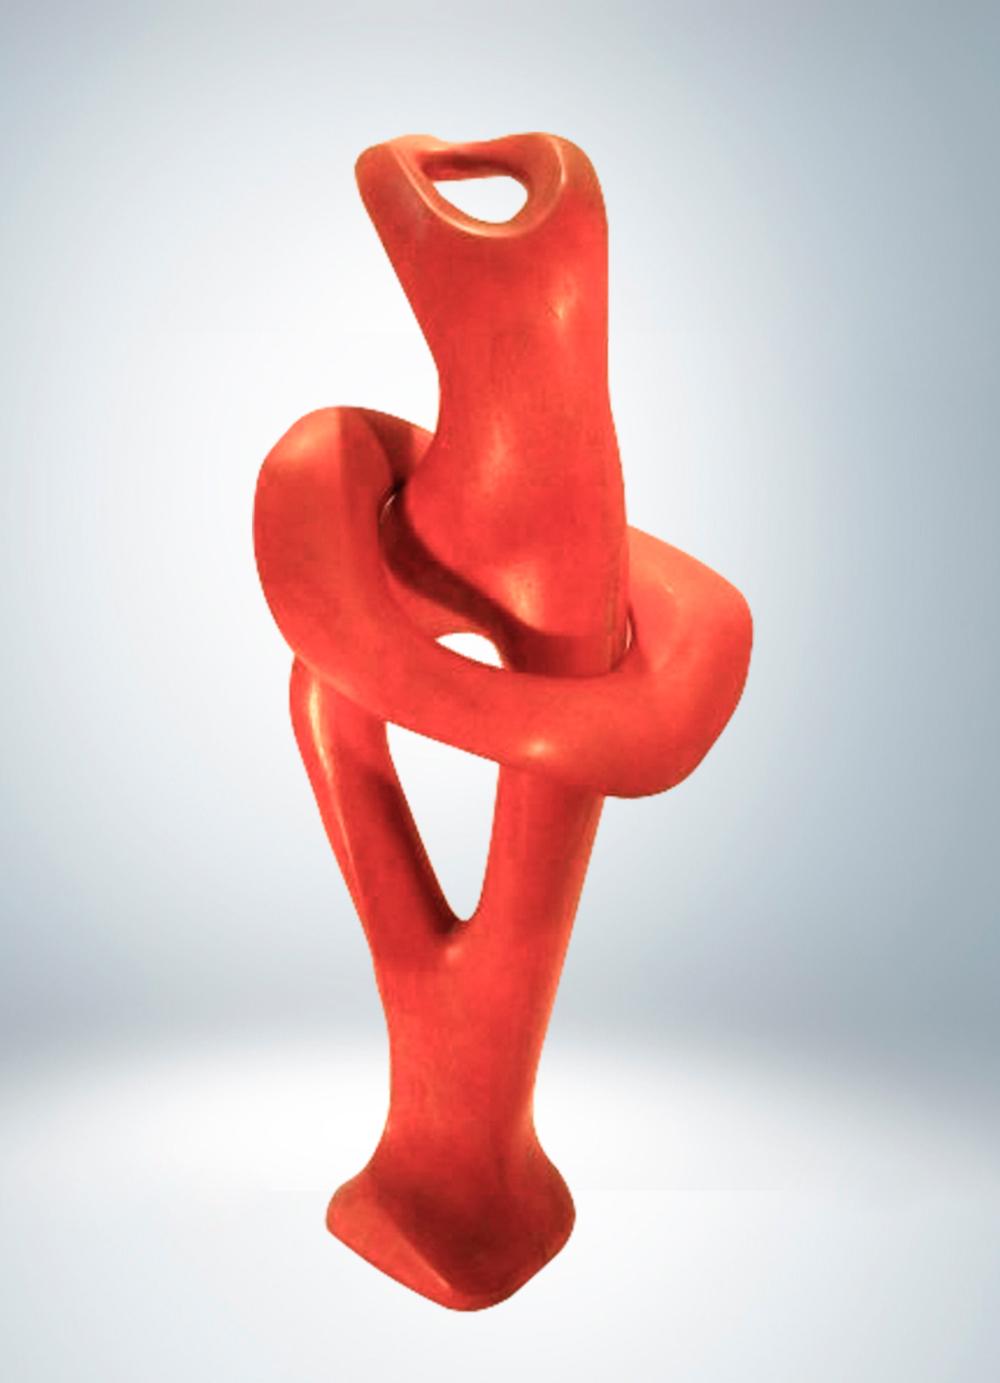 Escultura-Bailarina-Sapali-B-Figurativo-Abstracto-RD.Escultor